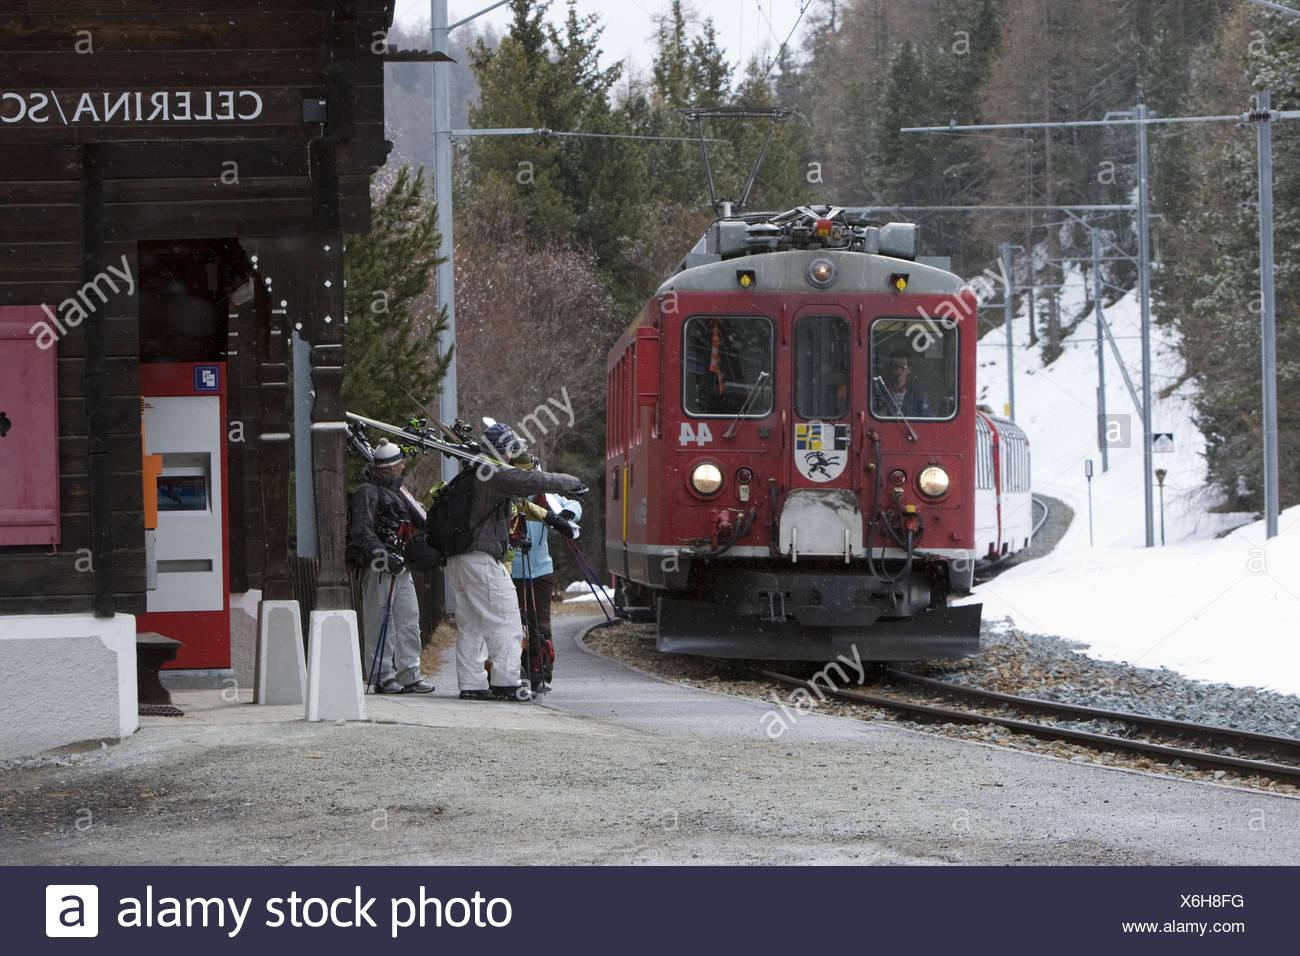 Switzerland, the Engadine, Celerina, railway station, skier, model released, - Stock Image